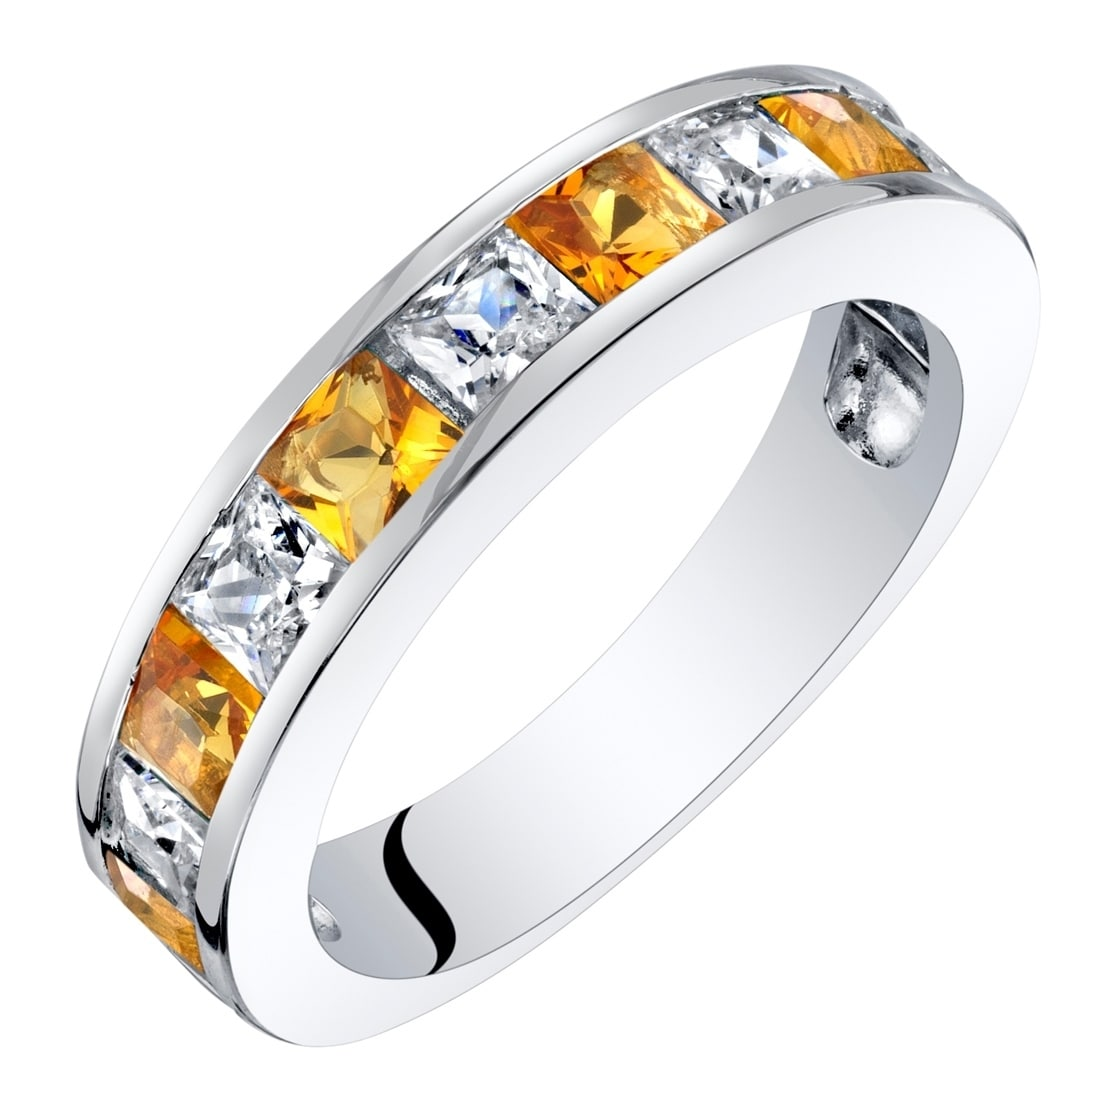 Shop Sterling Silver Princess Cut Citrine Half Eternity Wedding Ring